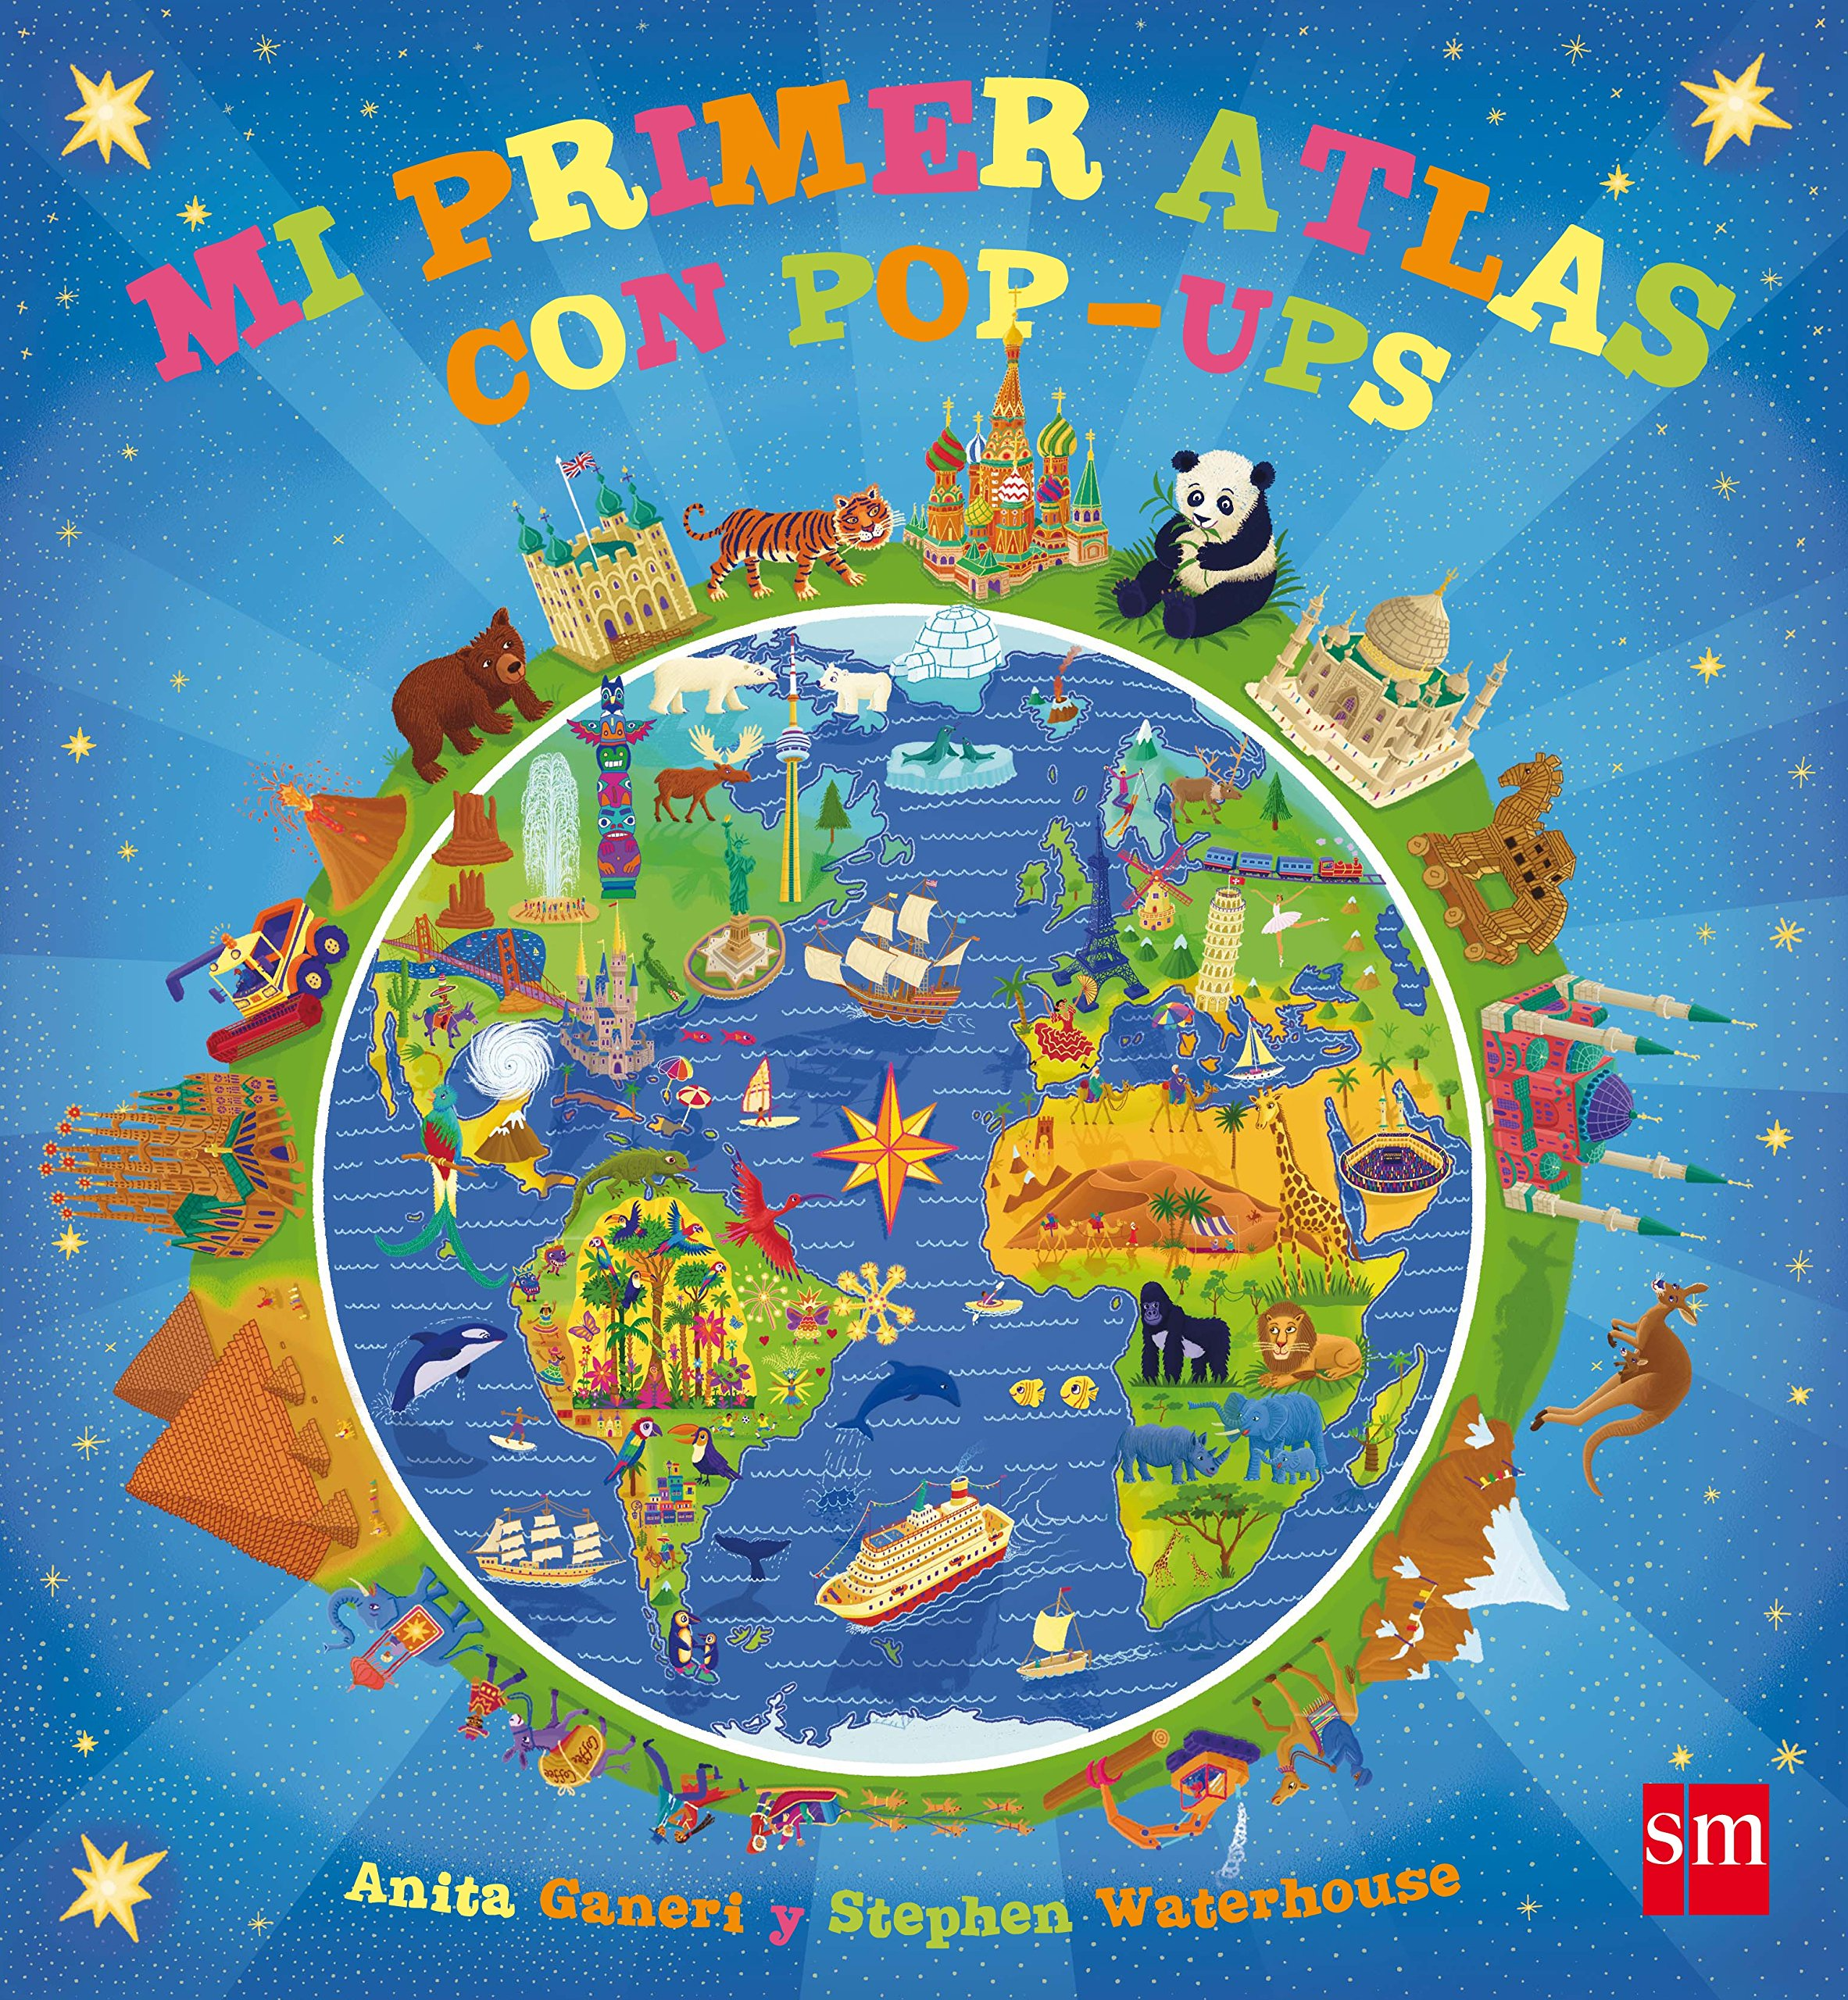 Mi primer atlas con pop-ups: Amazon.es: Anita Ganeri, Stephen Waterhouse,  Teresa Tellechea: Libros